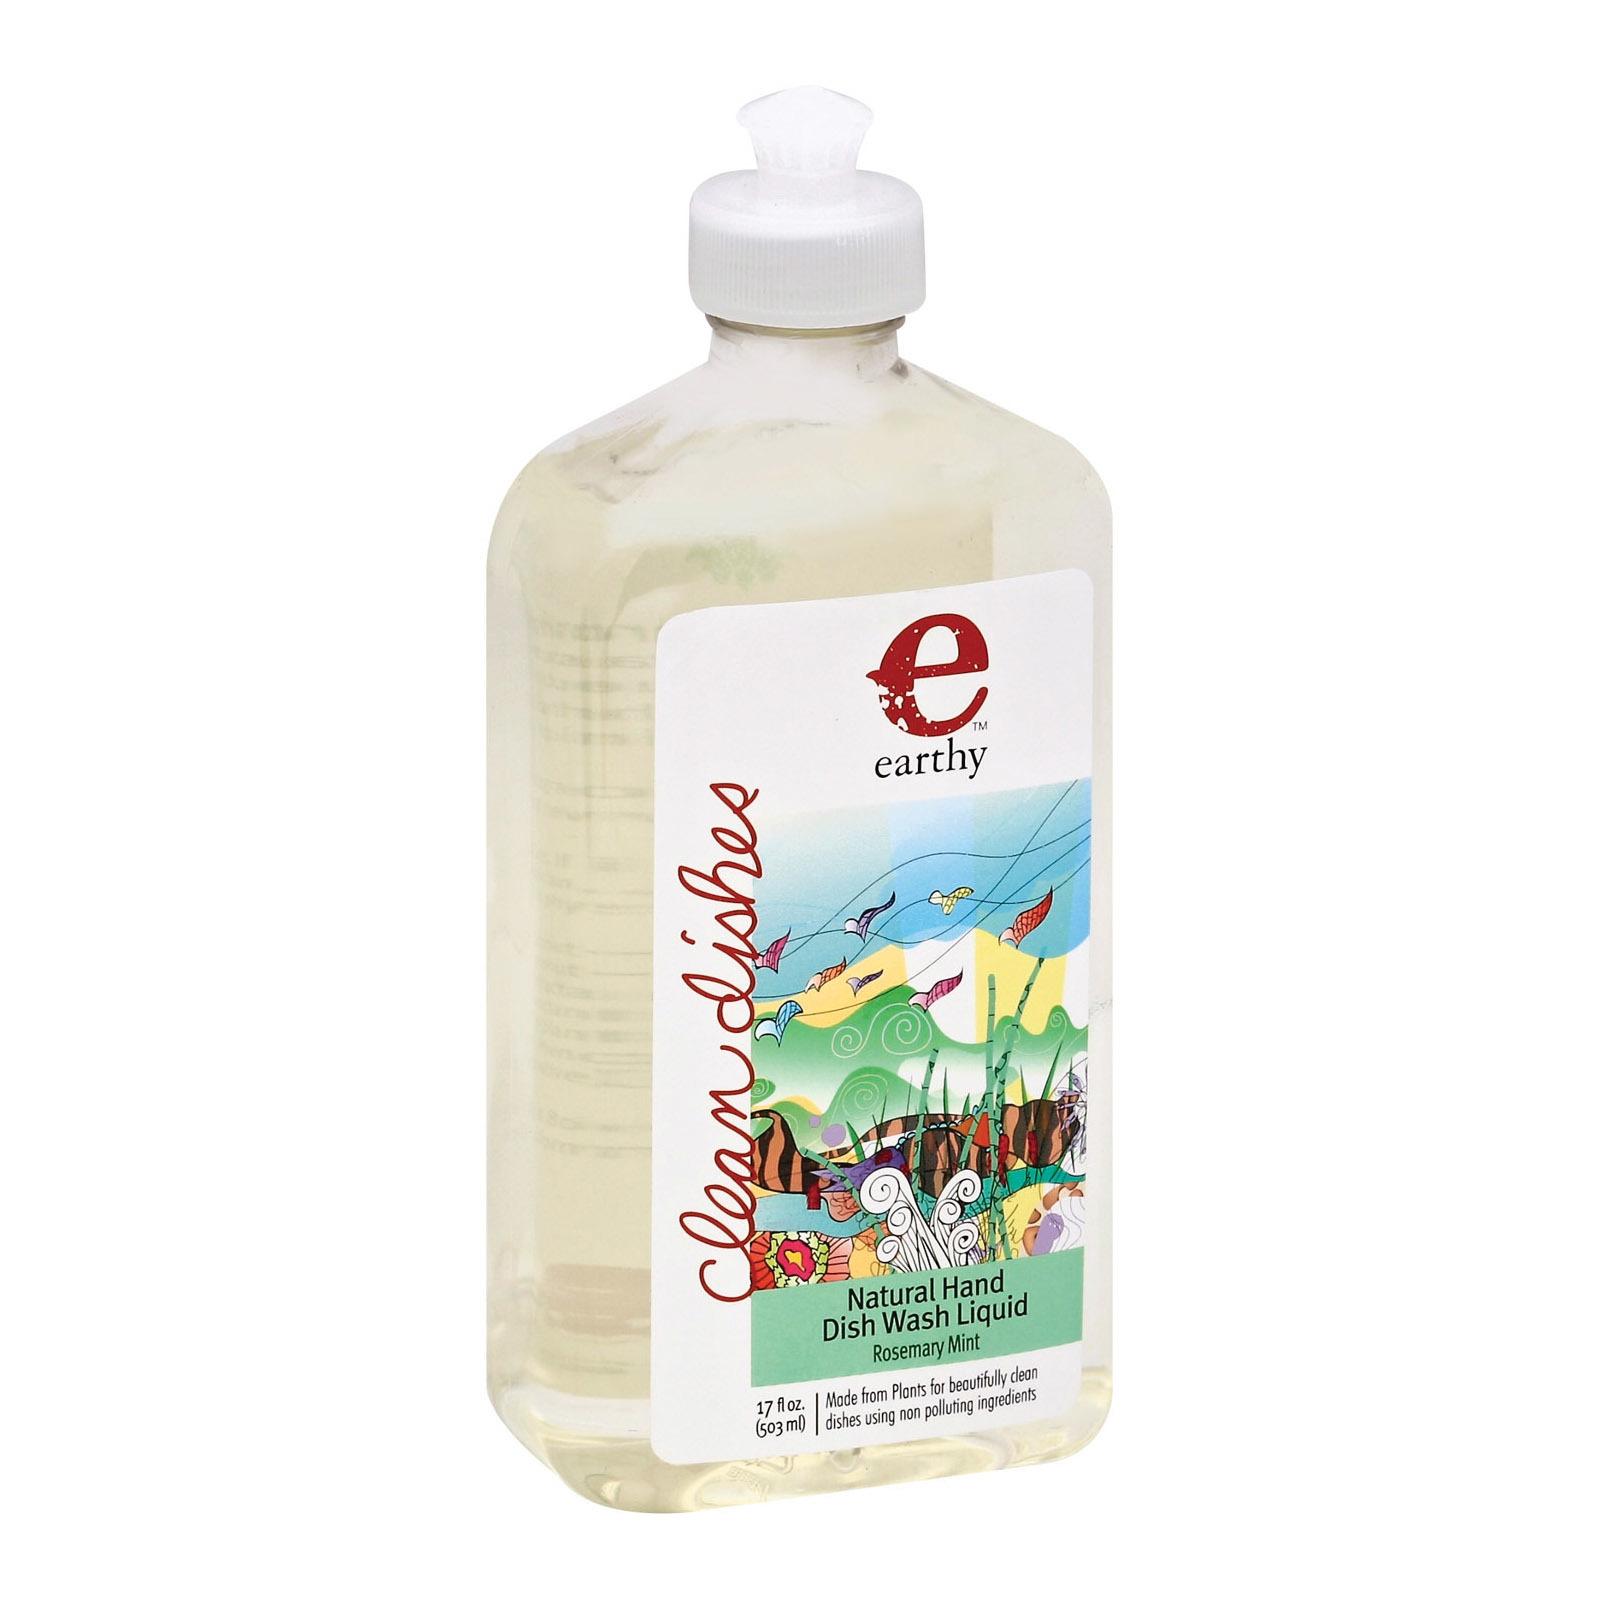 Earthy Natural Dish Liquid - Rosemary Mint - Case of 6 - 17 fl oz